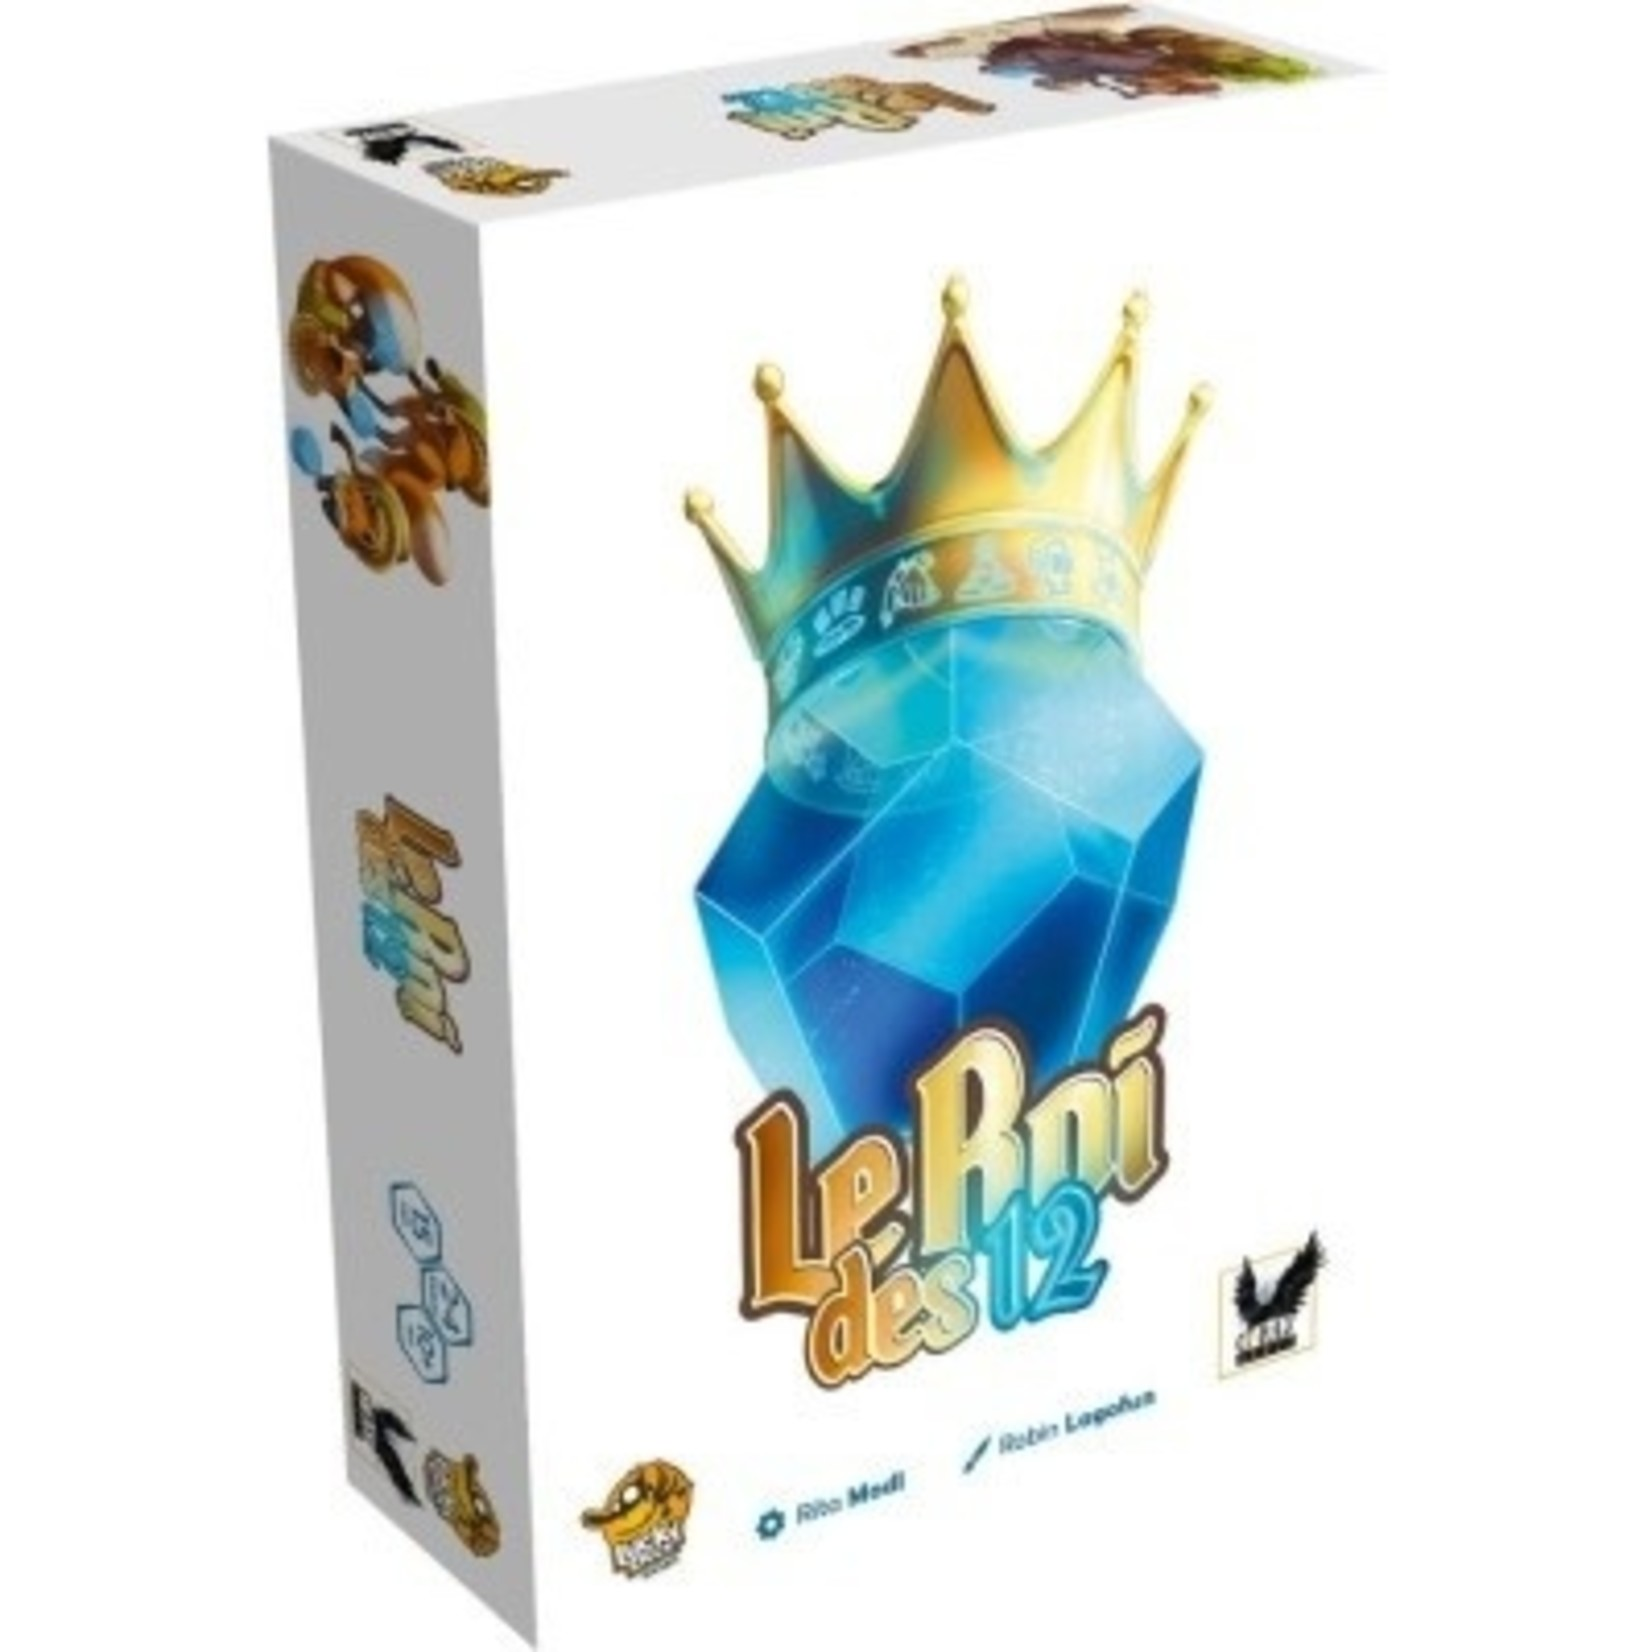 Lucky Duck  Games Le Roi des 12